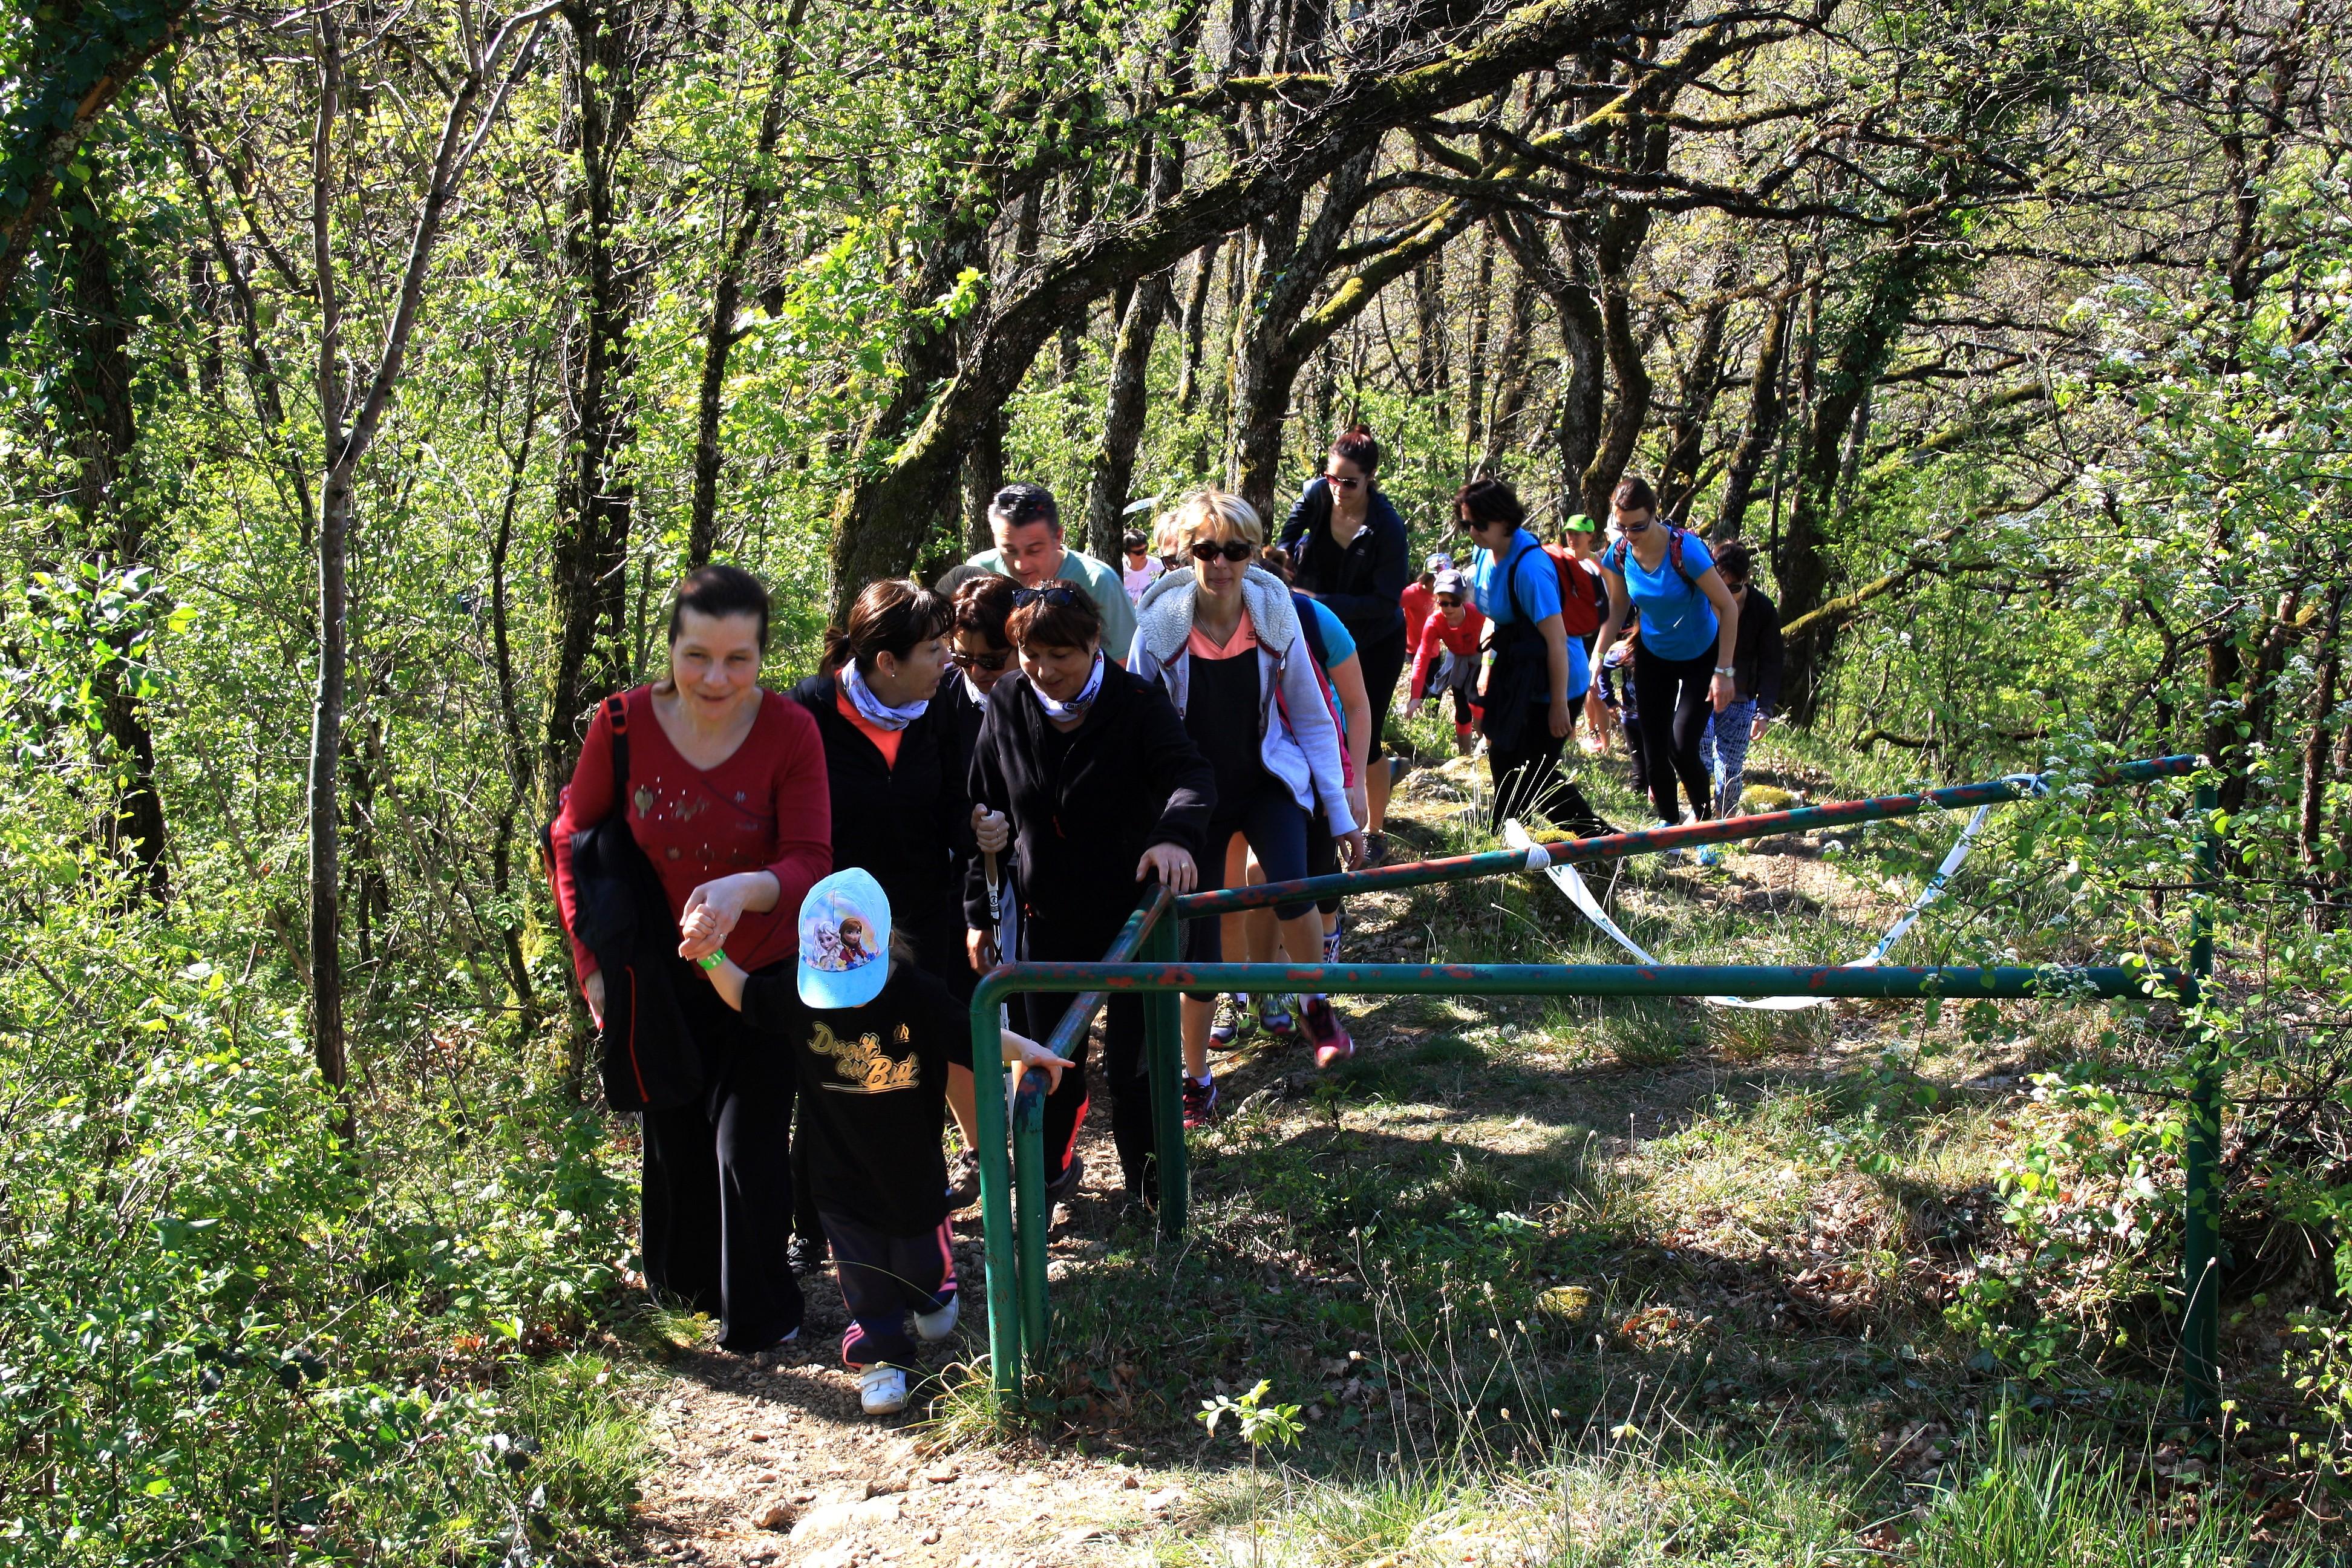 2017-04-09 - Trail-Montfaucon (223)